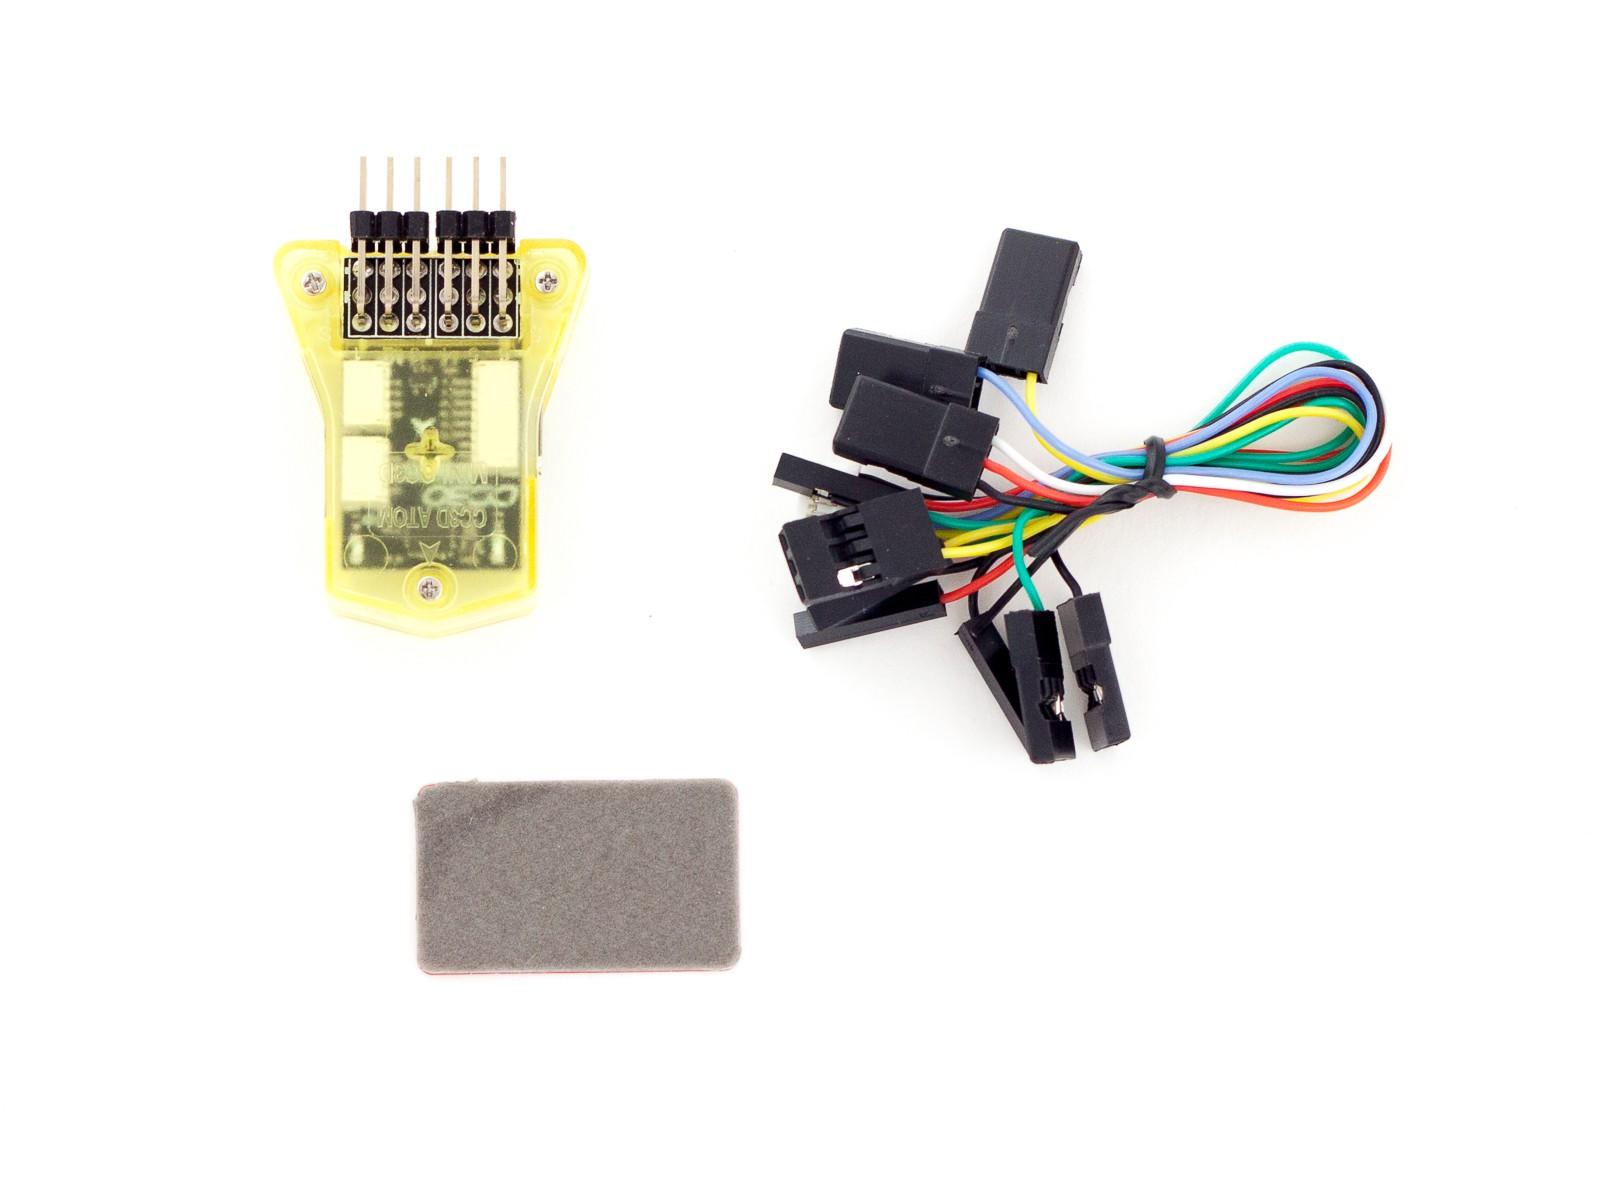 Openpilot MINI CC3D